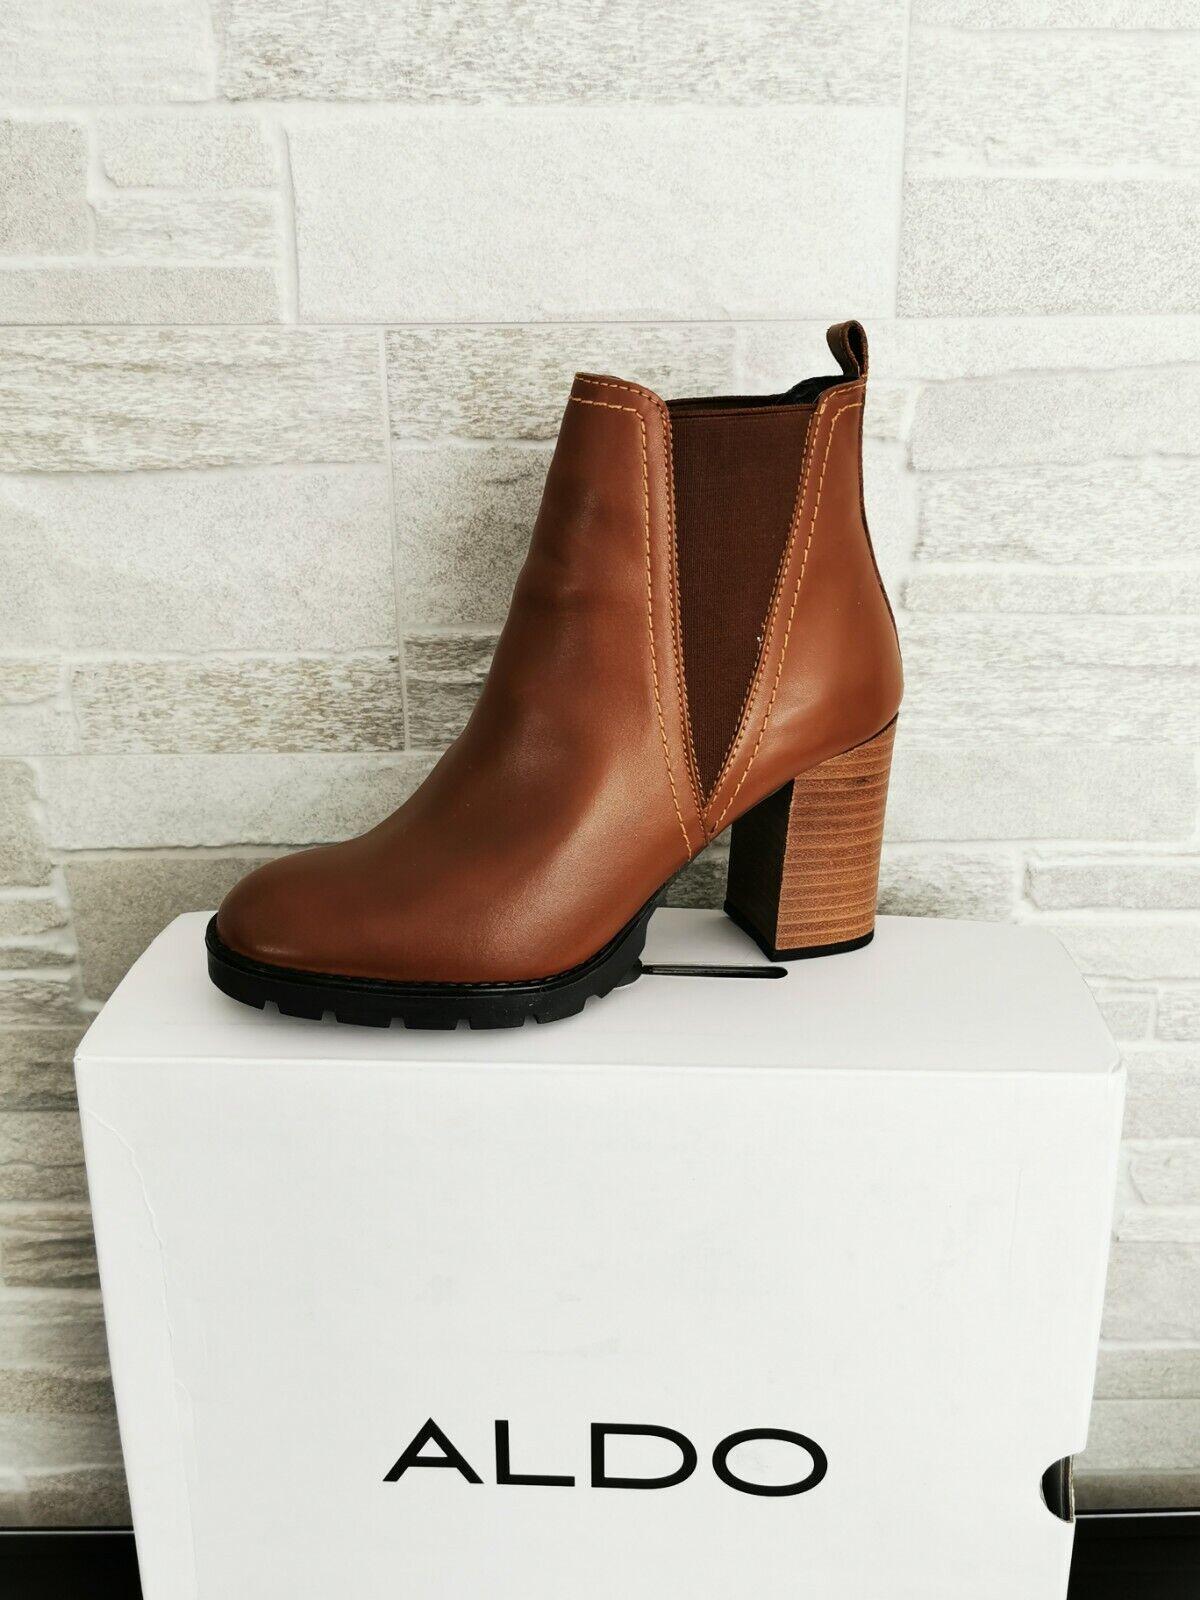 ALDO Ladies Size 4 UK (37) GALOREVIA Tan Leather Chelsea Boots NEW BOXED